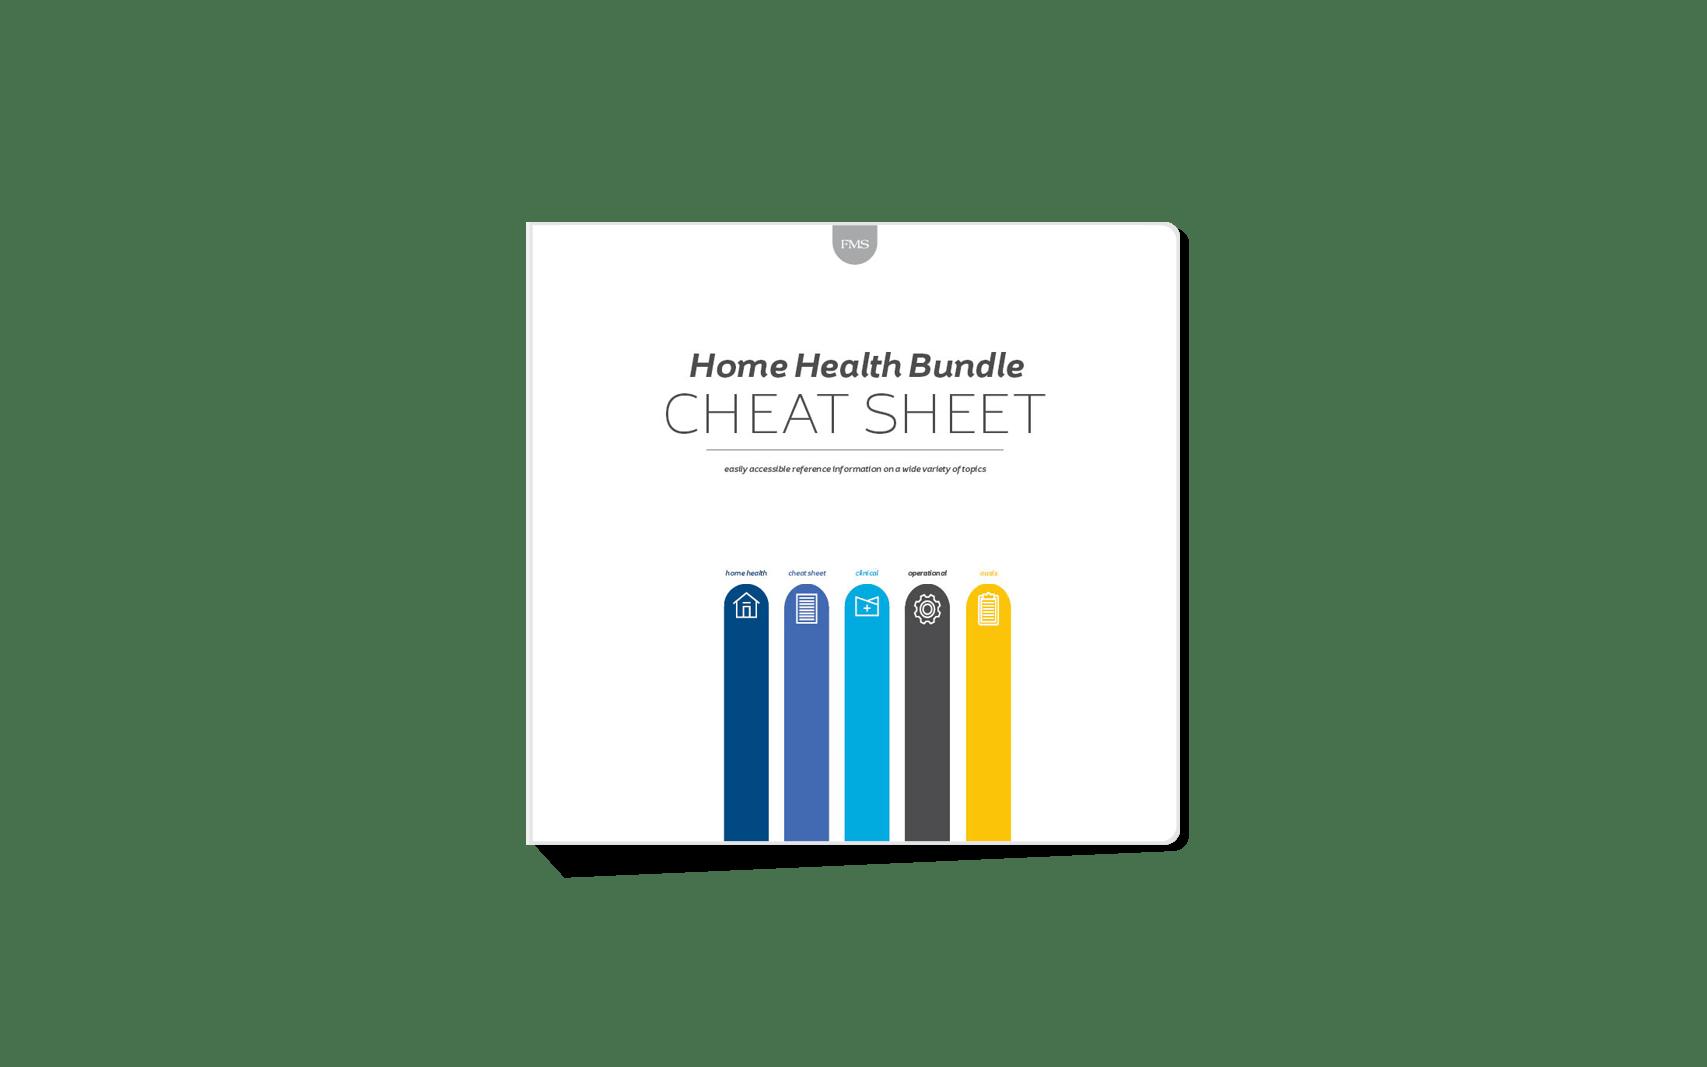 Mac Legacy Formerly Fms Home Health Cheat Sheet Bundle